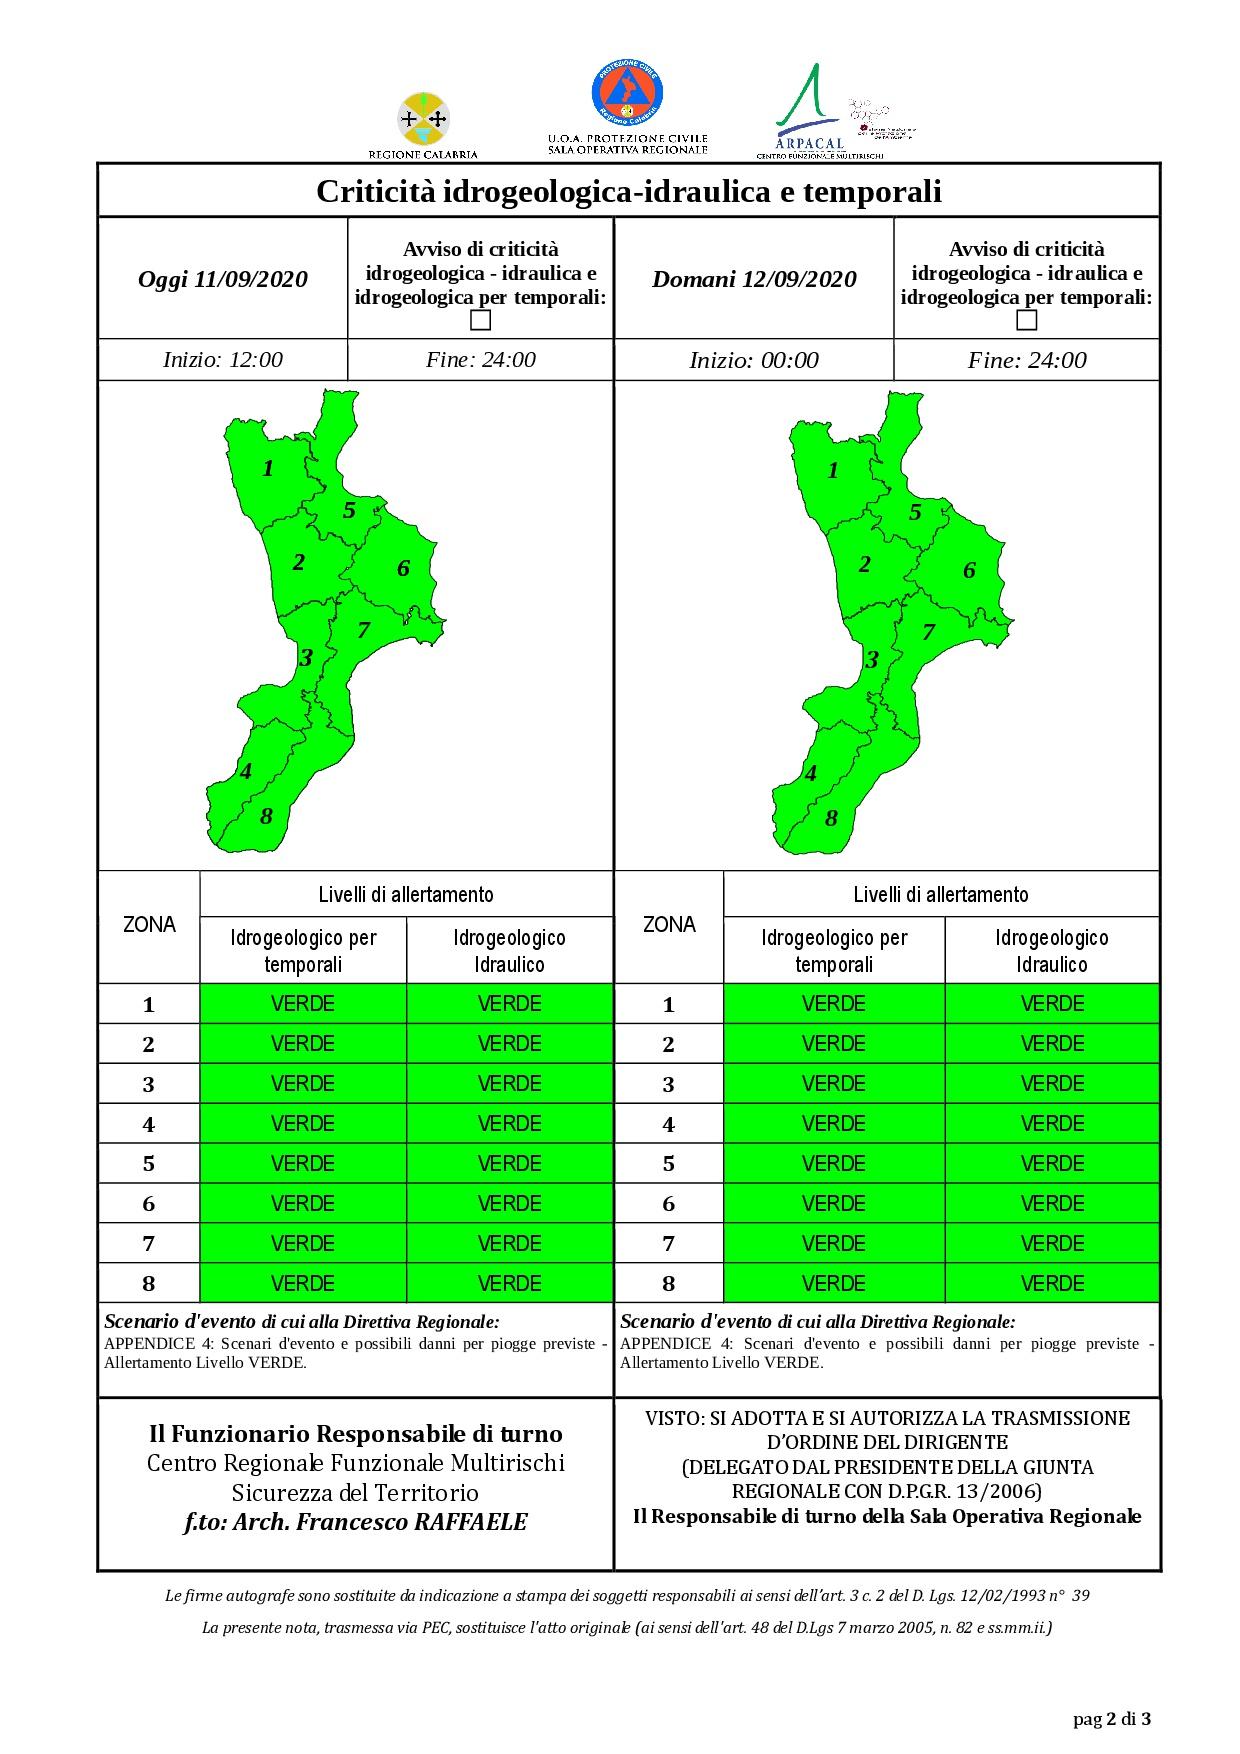 Criticità idrogeologica-idraulica e temporali in Calabria 11-09-2020